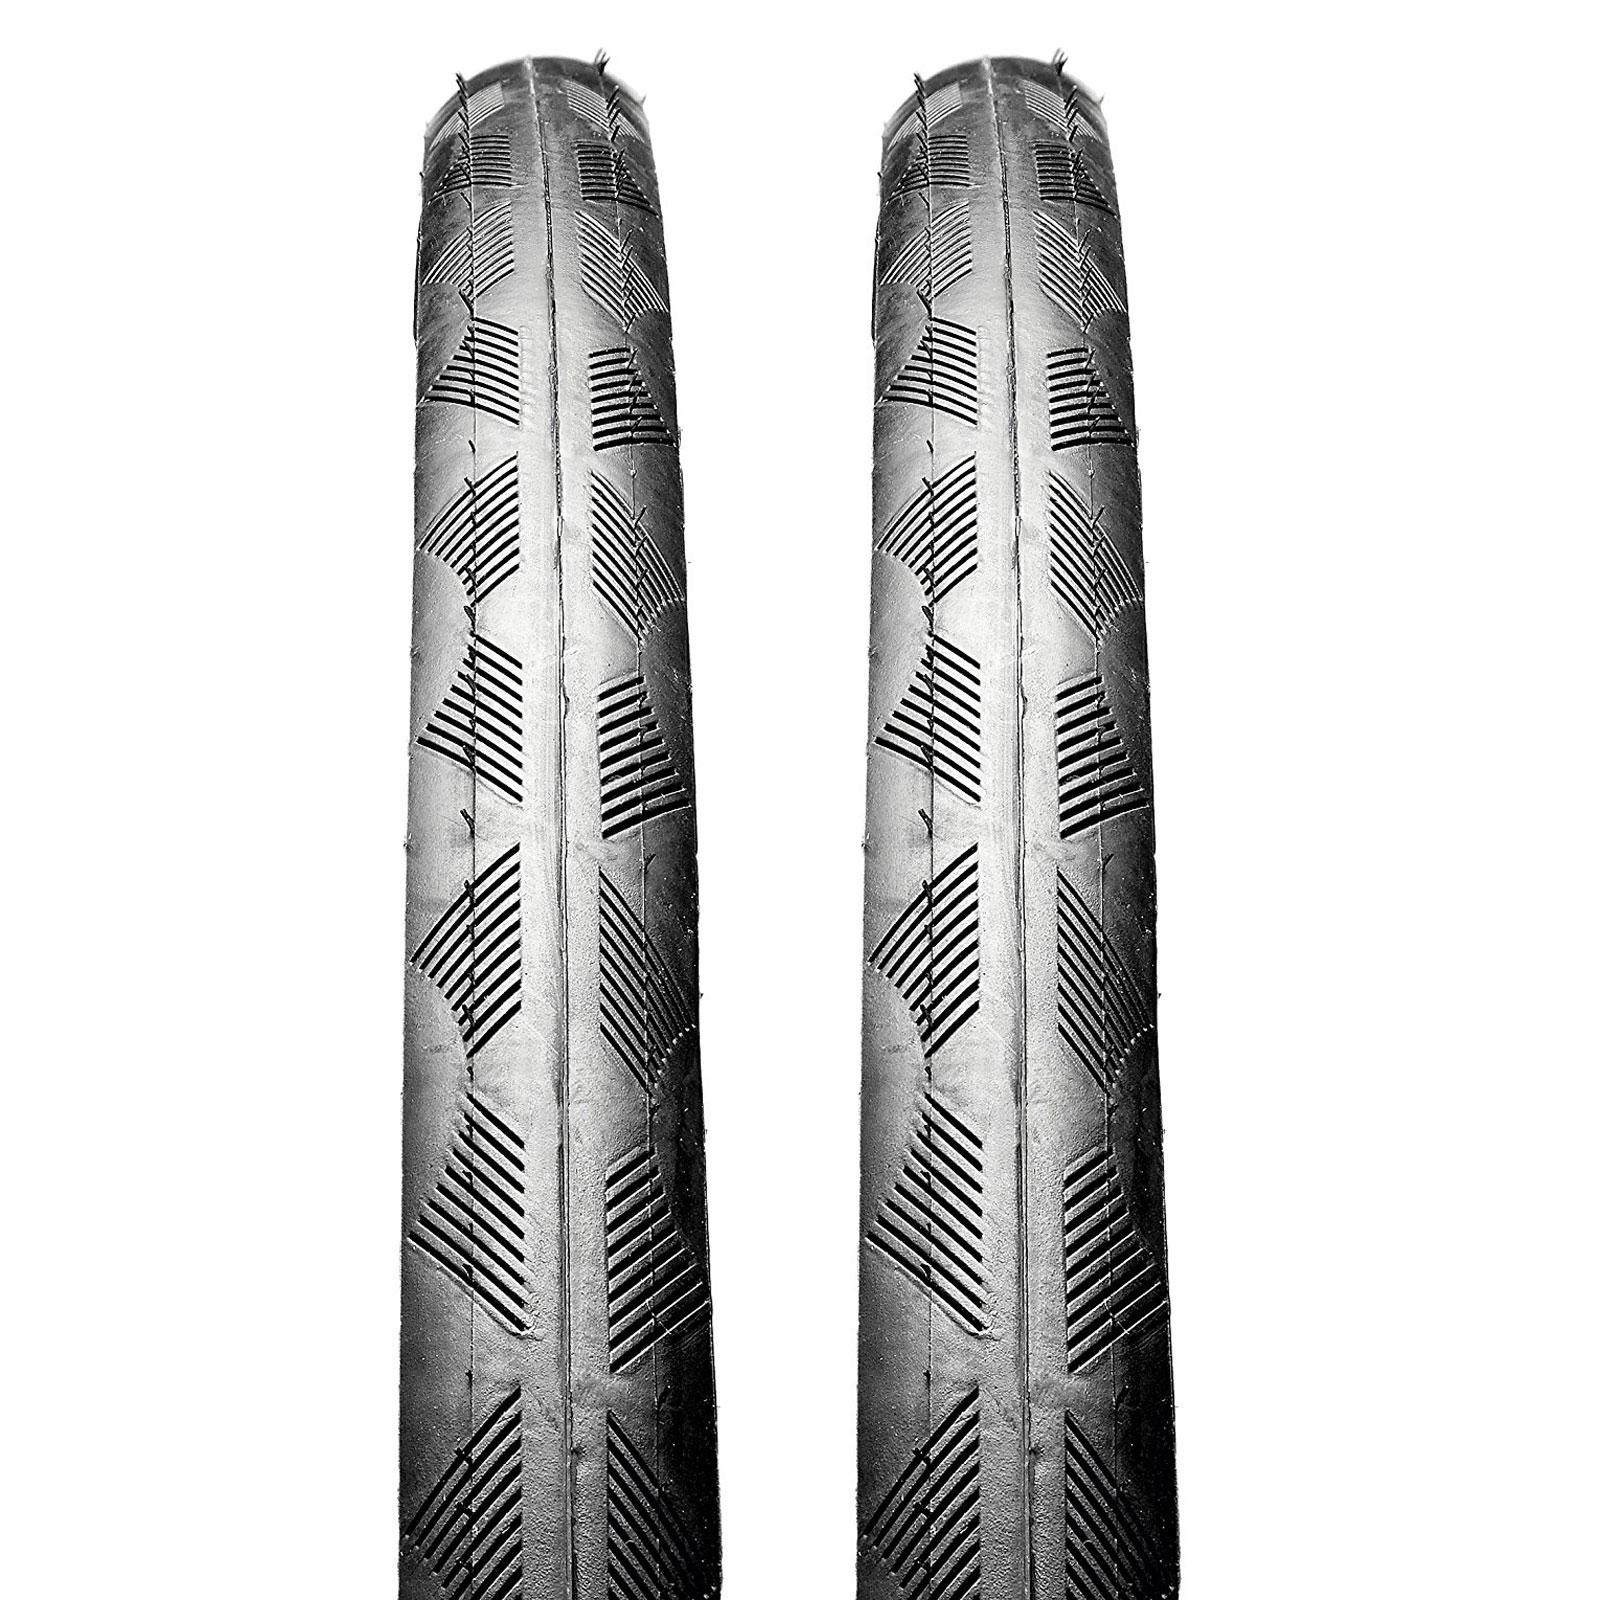 Hutchinson-Nitro-2-Noir-Velo-De-Route-Pneus-amp-Presta-Tubes-700-x-28-C miniature 9